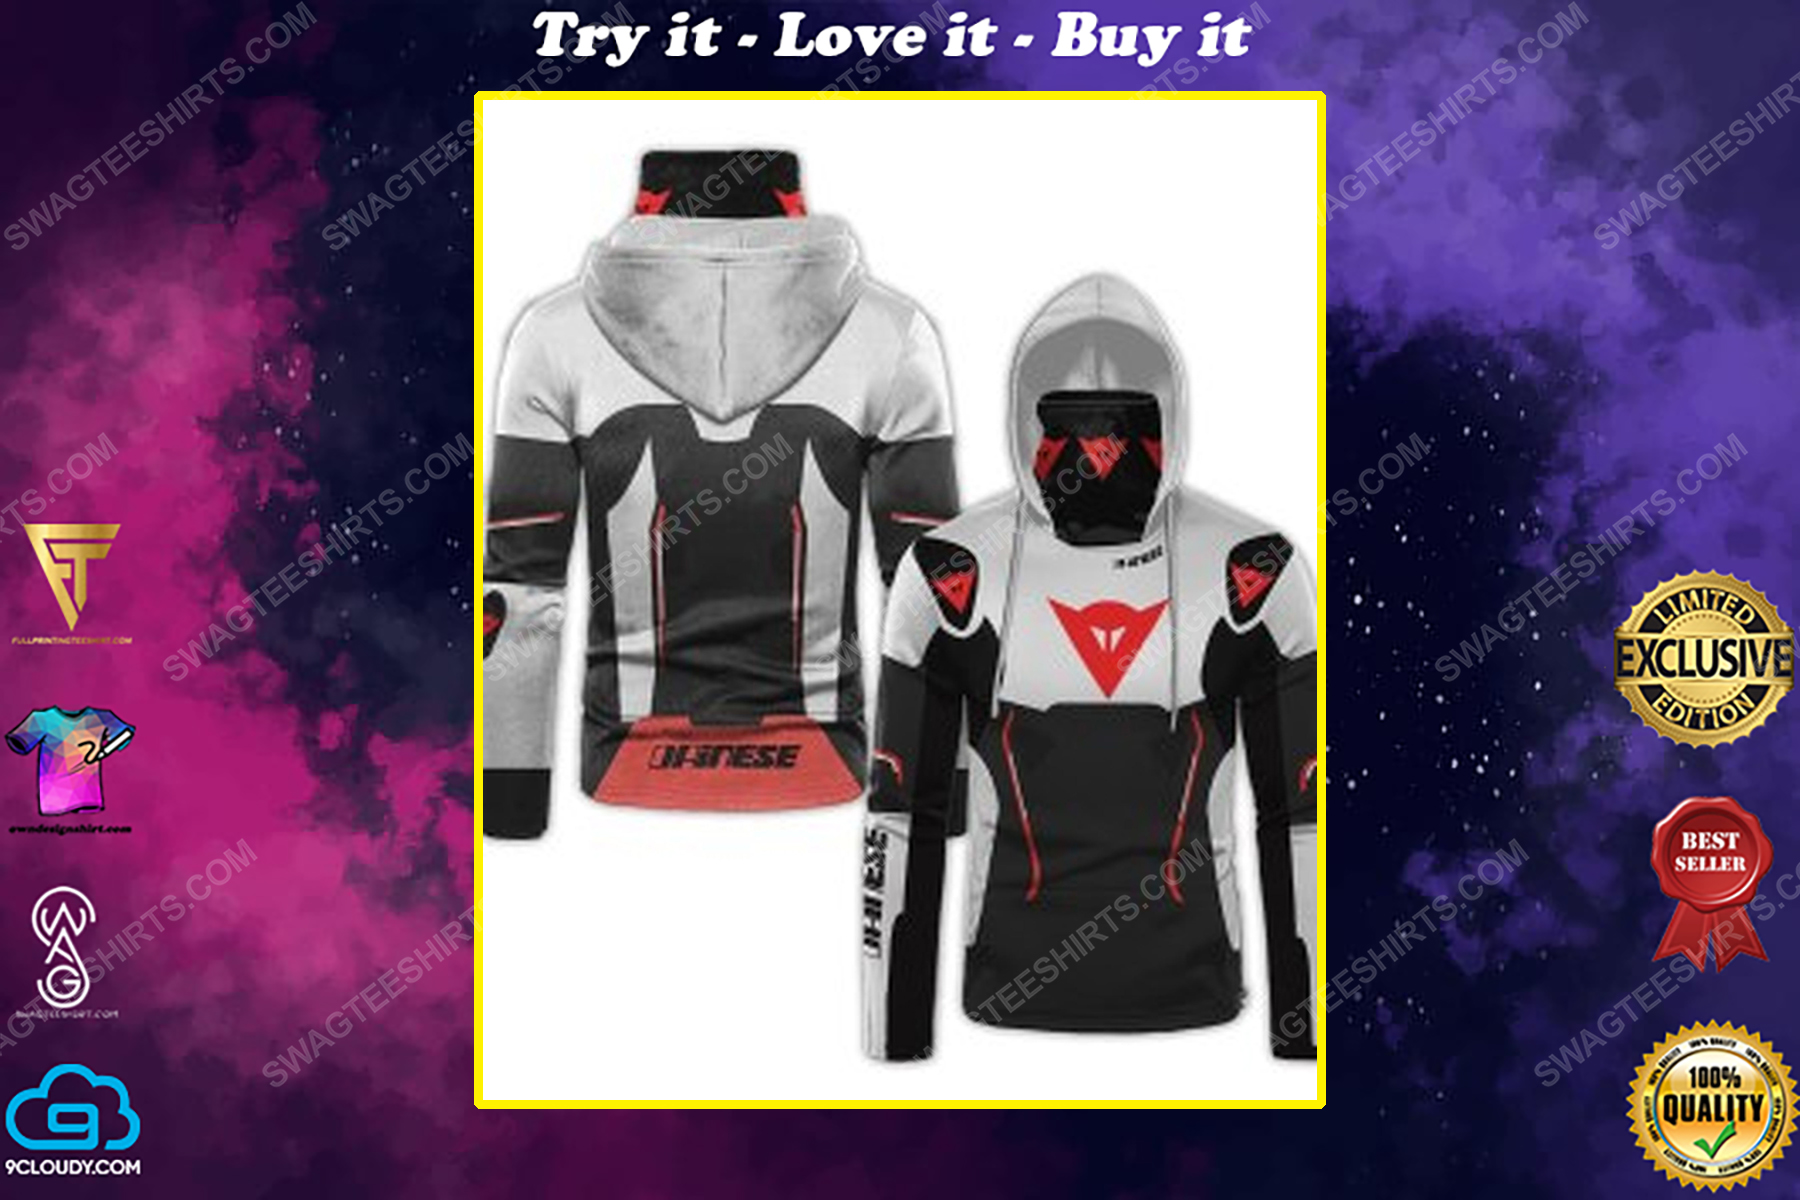 Custom name dainese racing full print mask hoodie